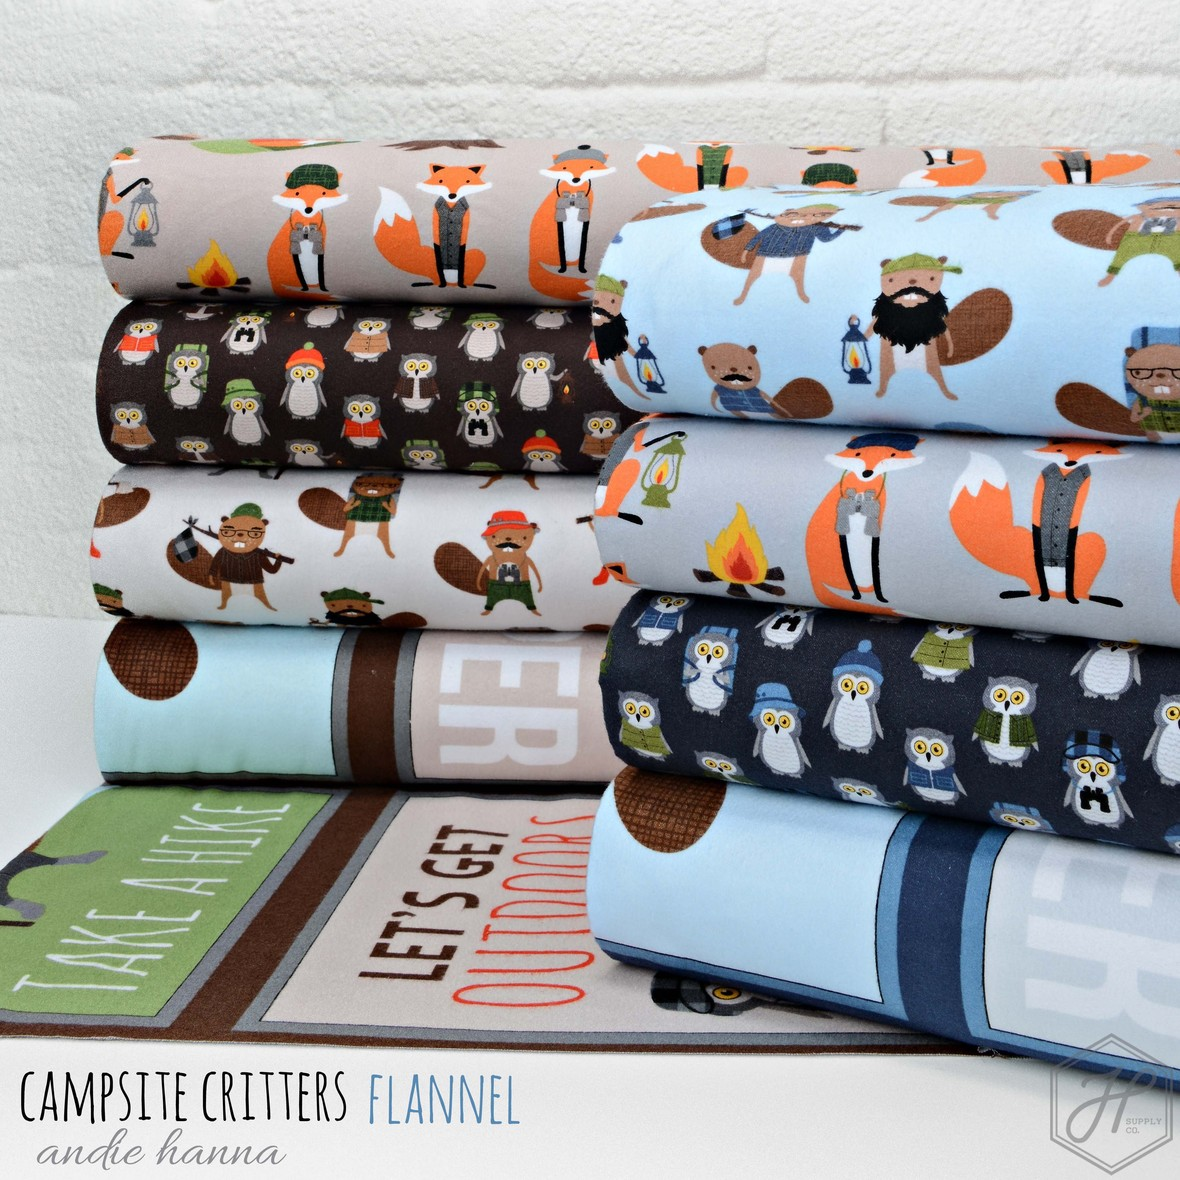 Campsite Critters Flannel